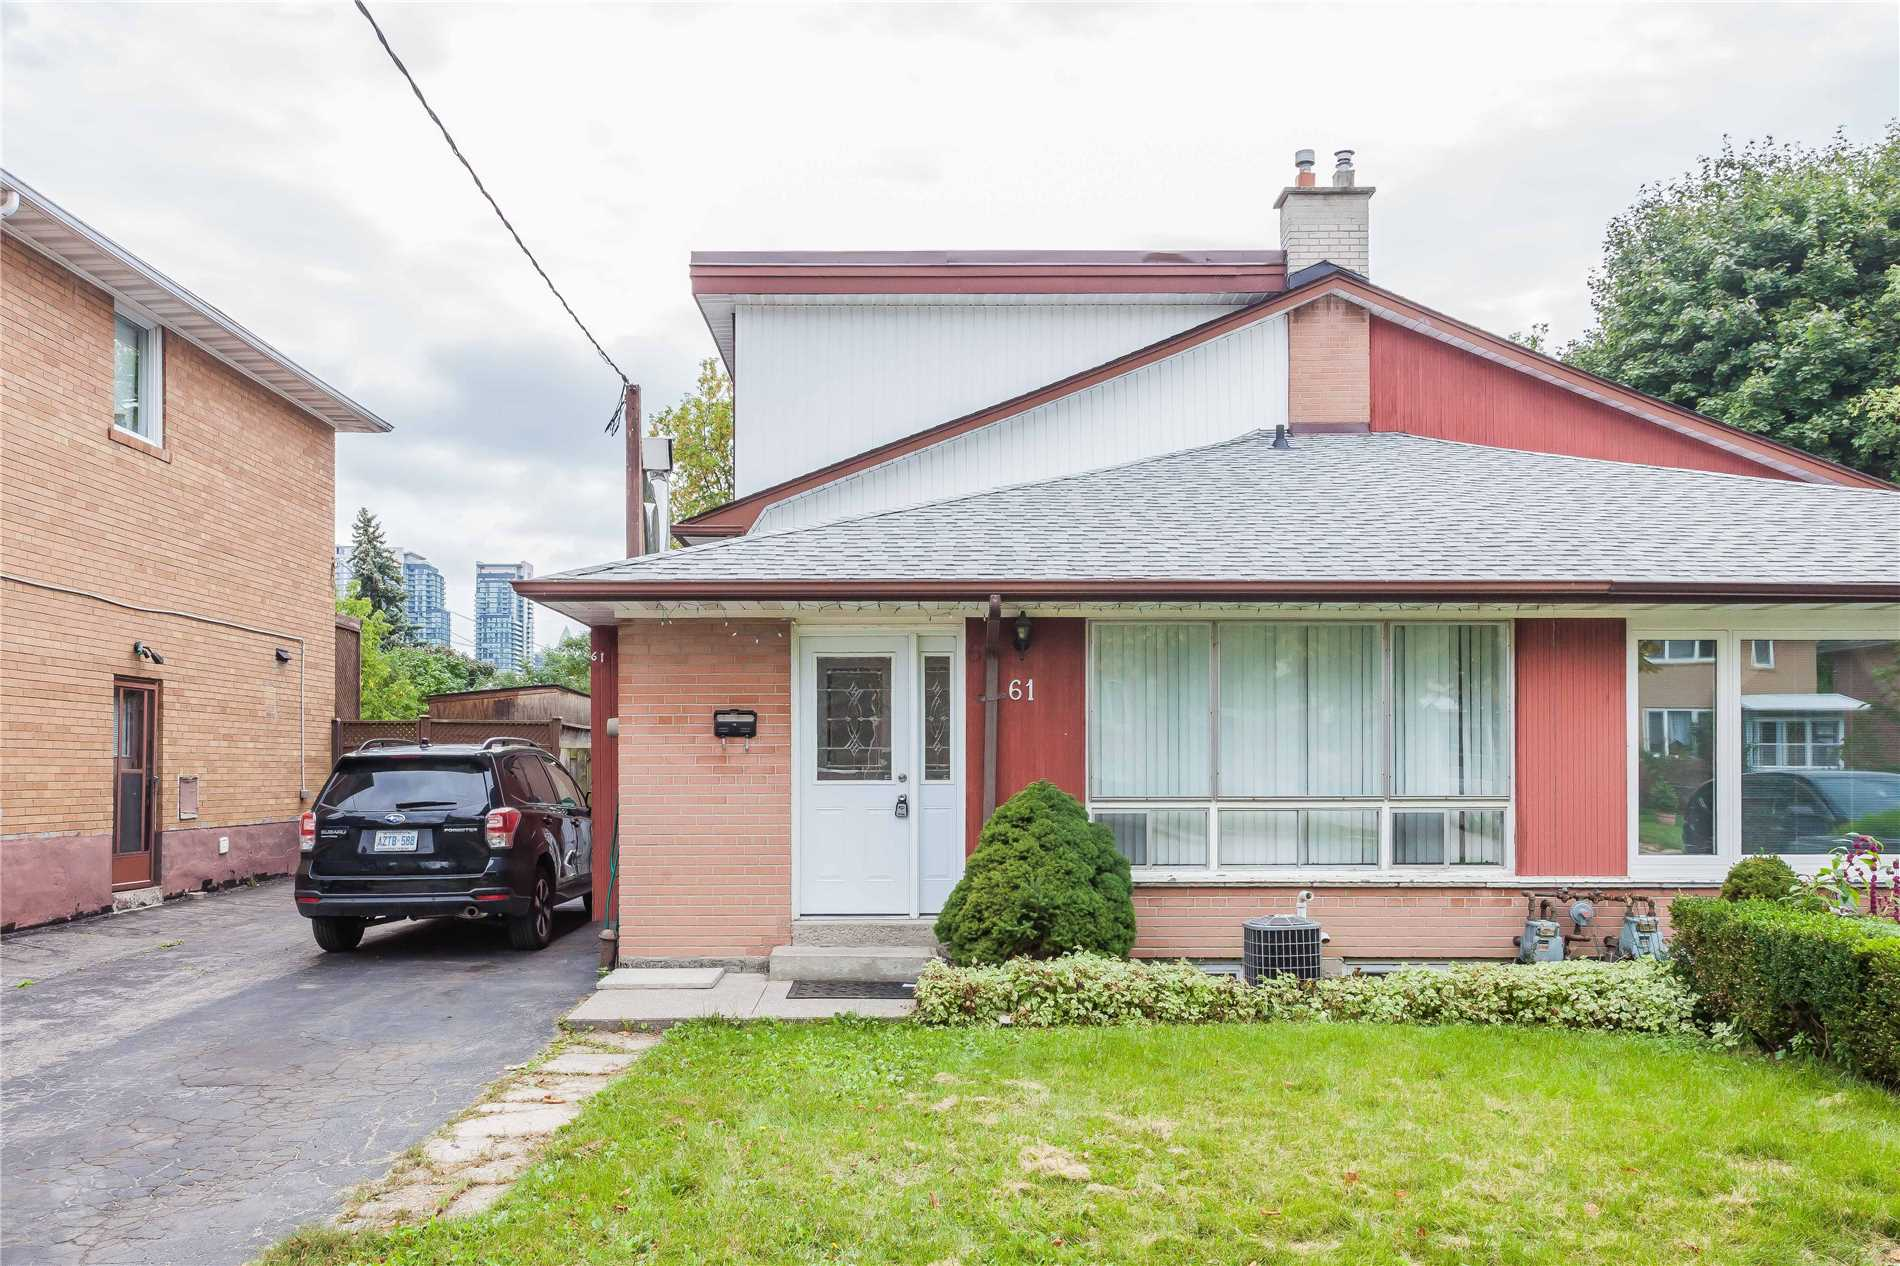 61 Holcolm Rd, Toronto